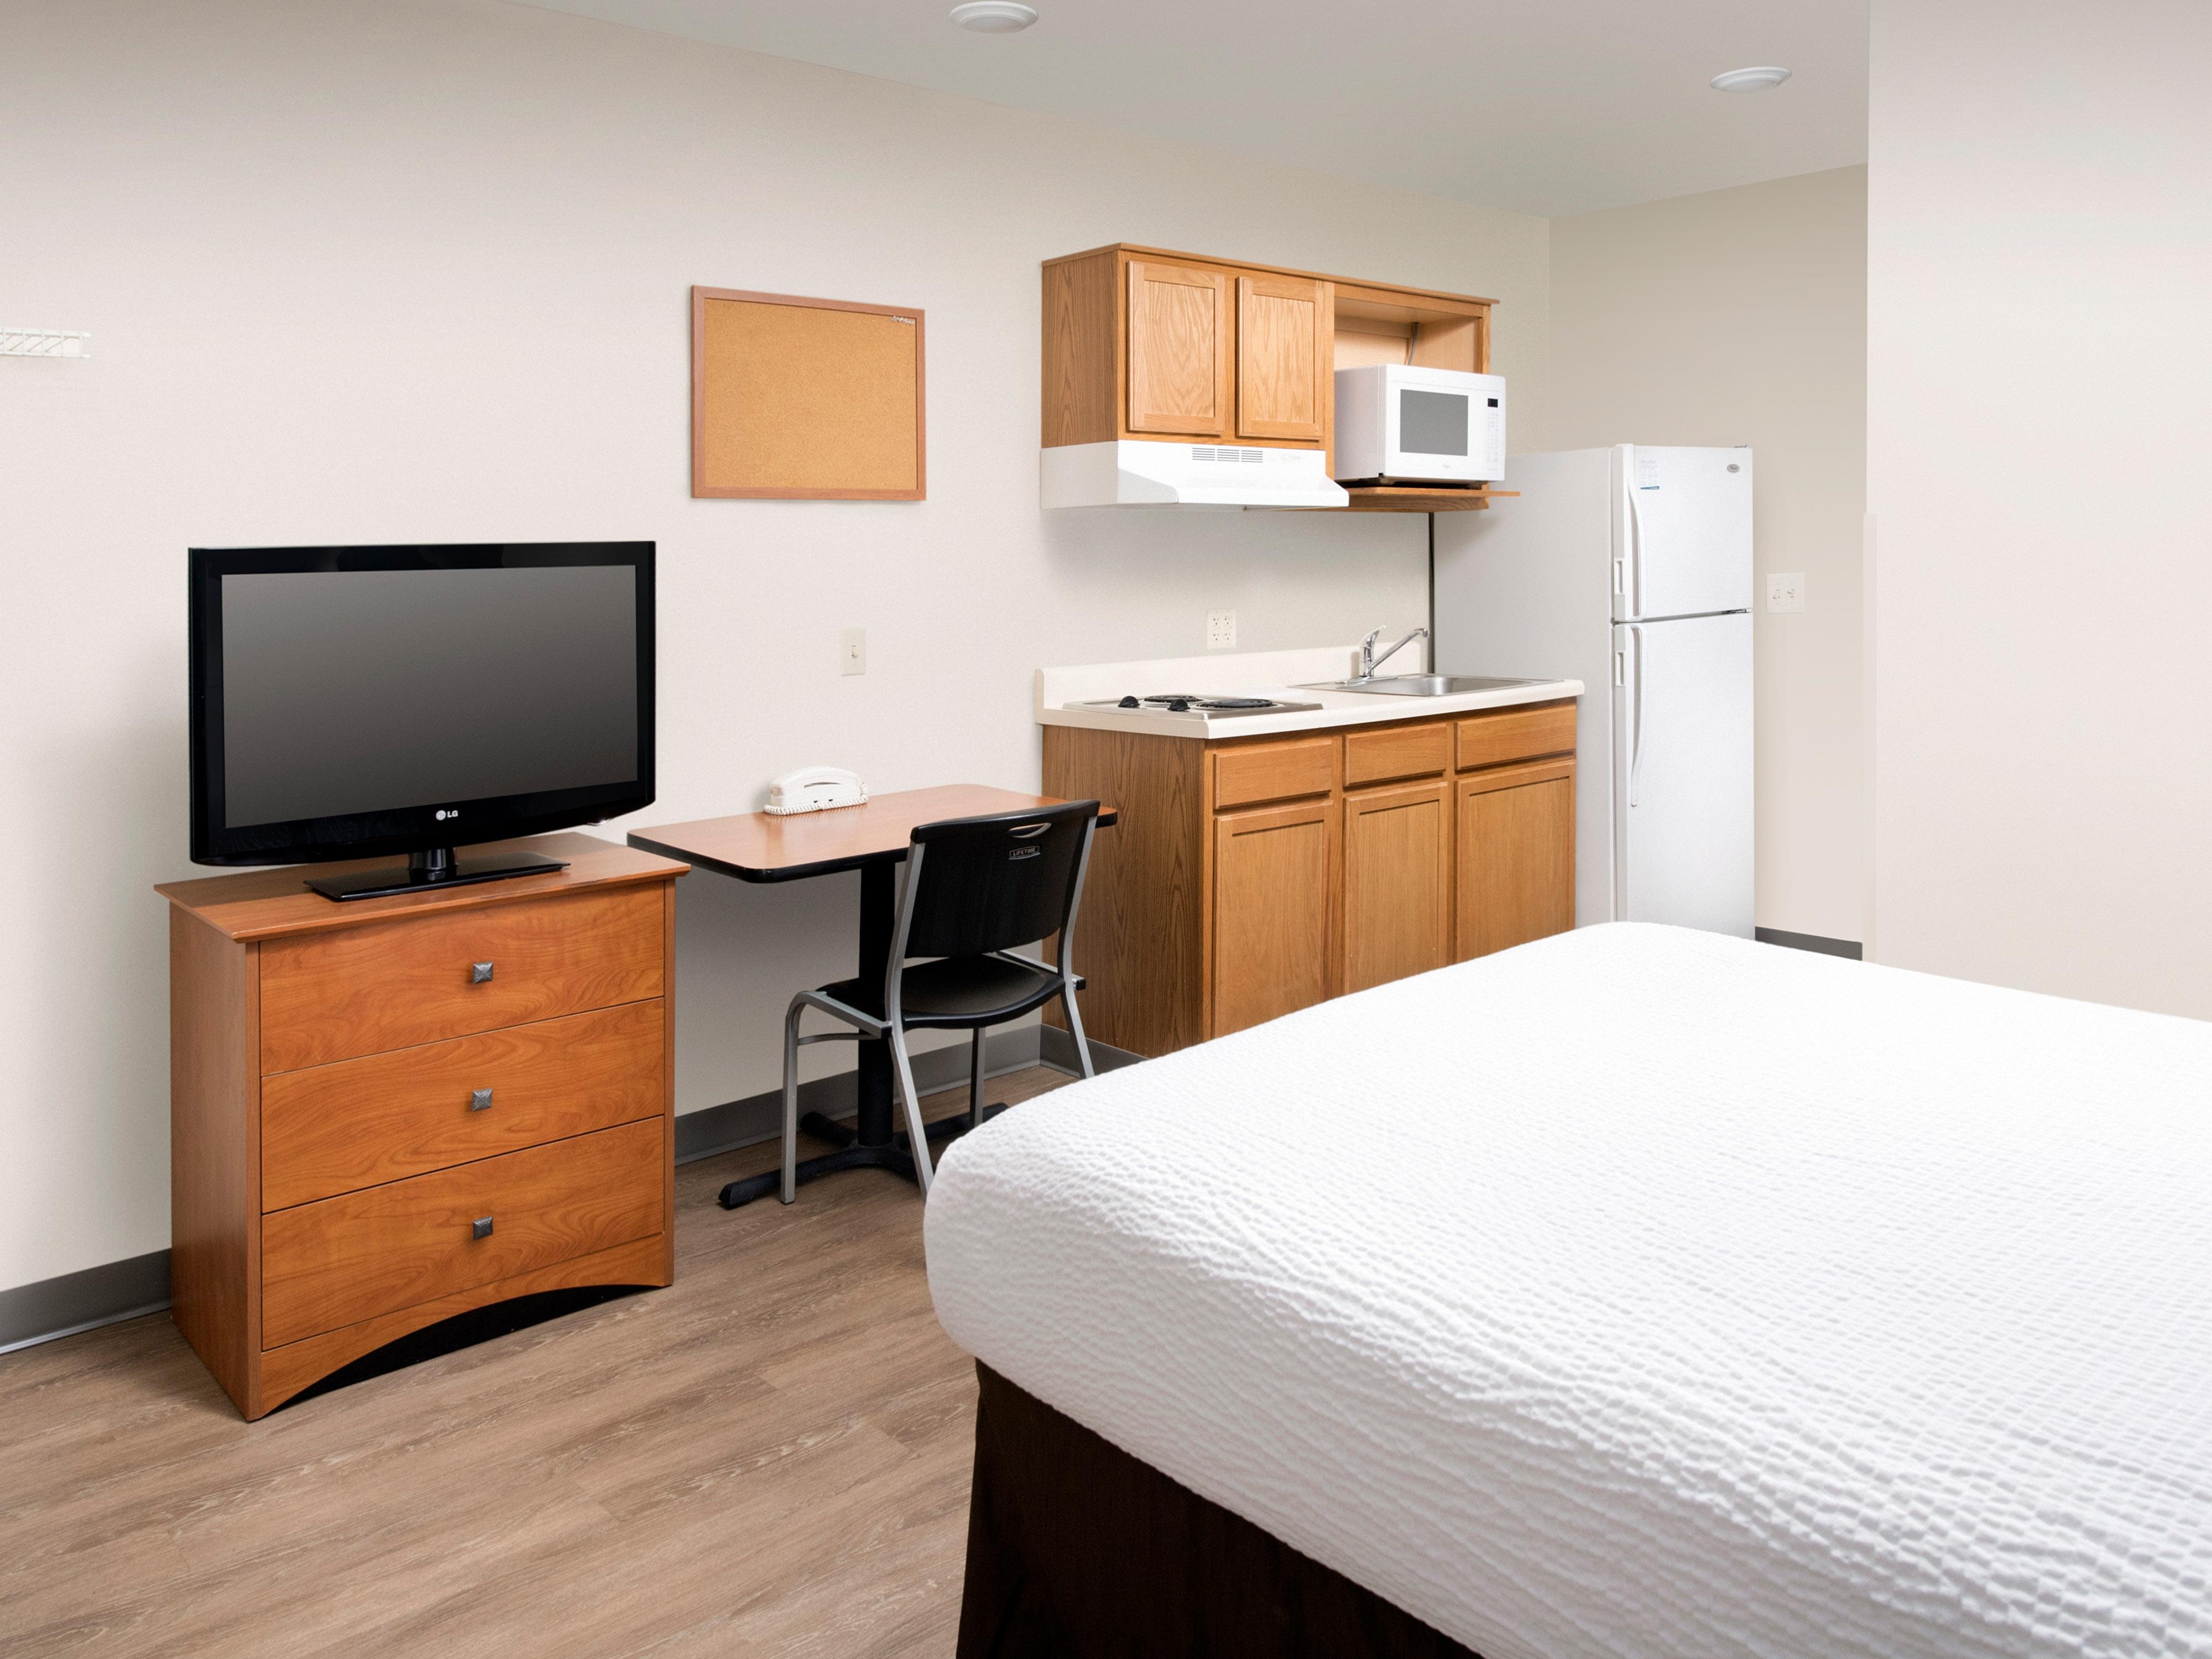 WoodSpring Suites Pensacola Northeast image 1